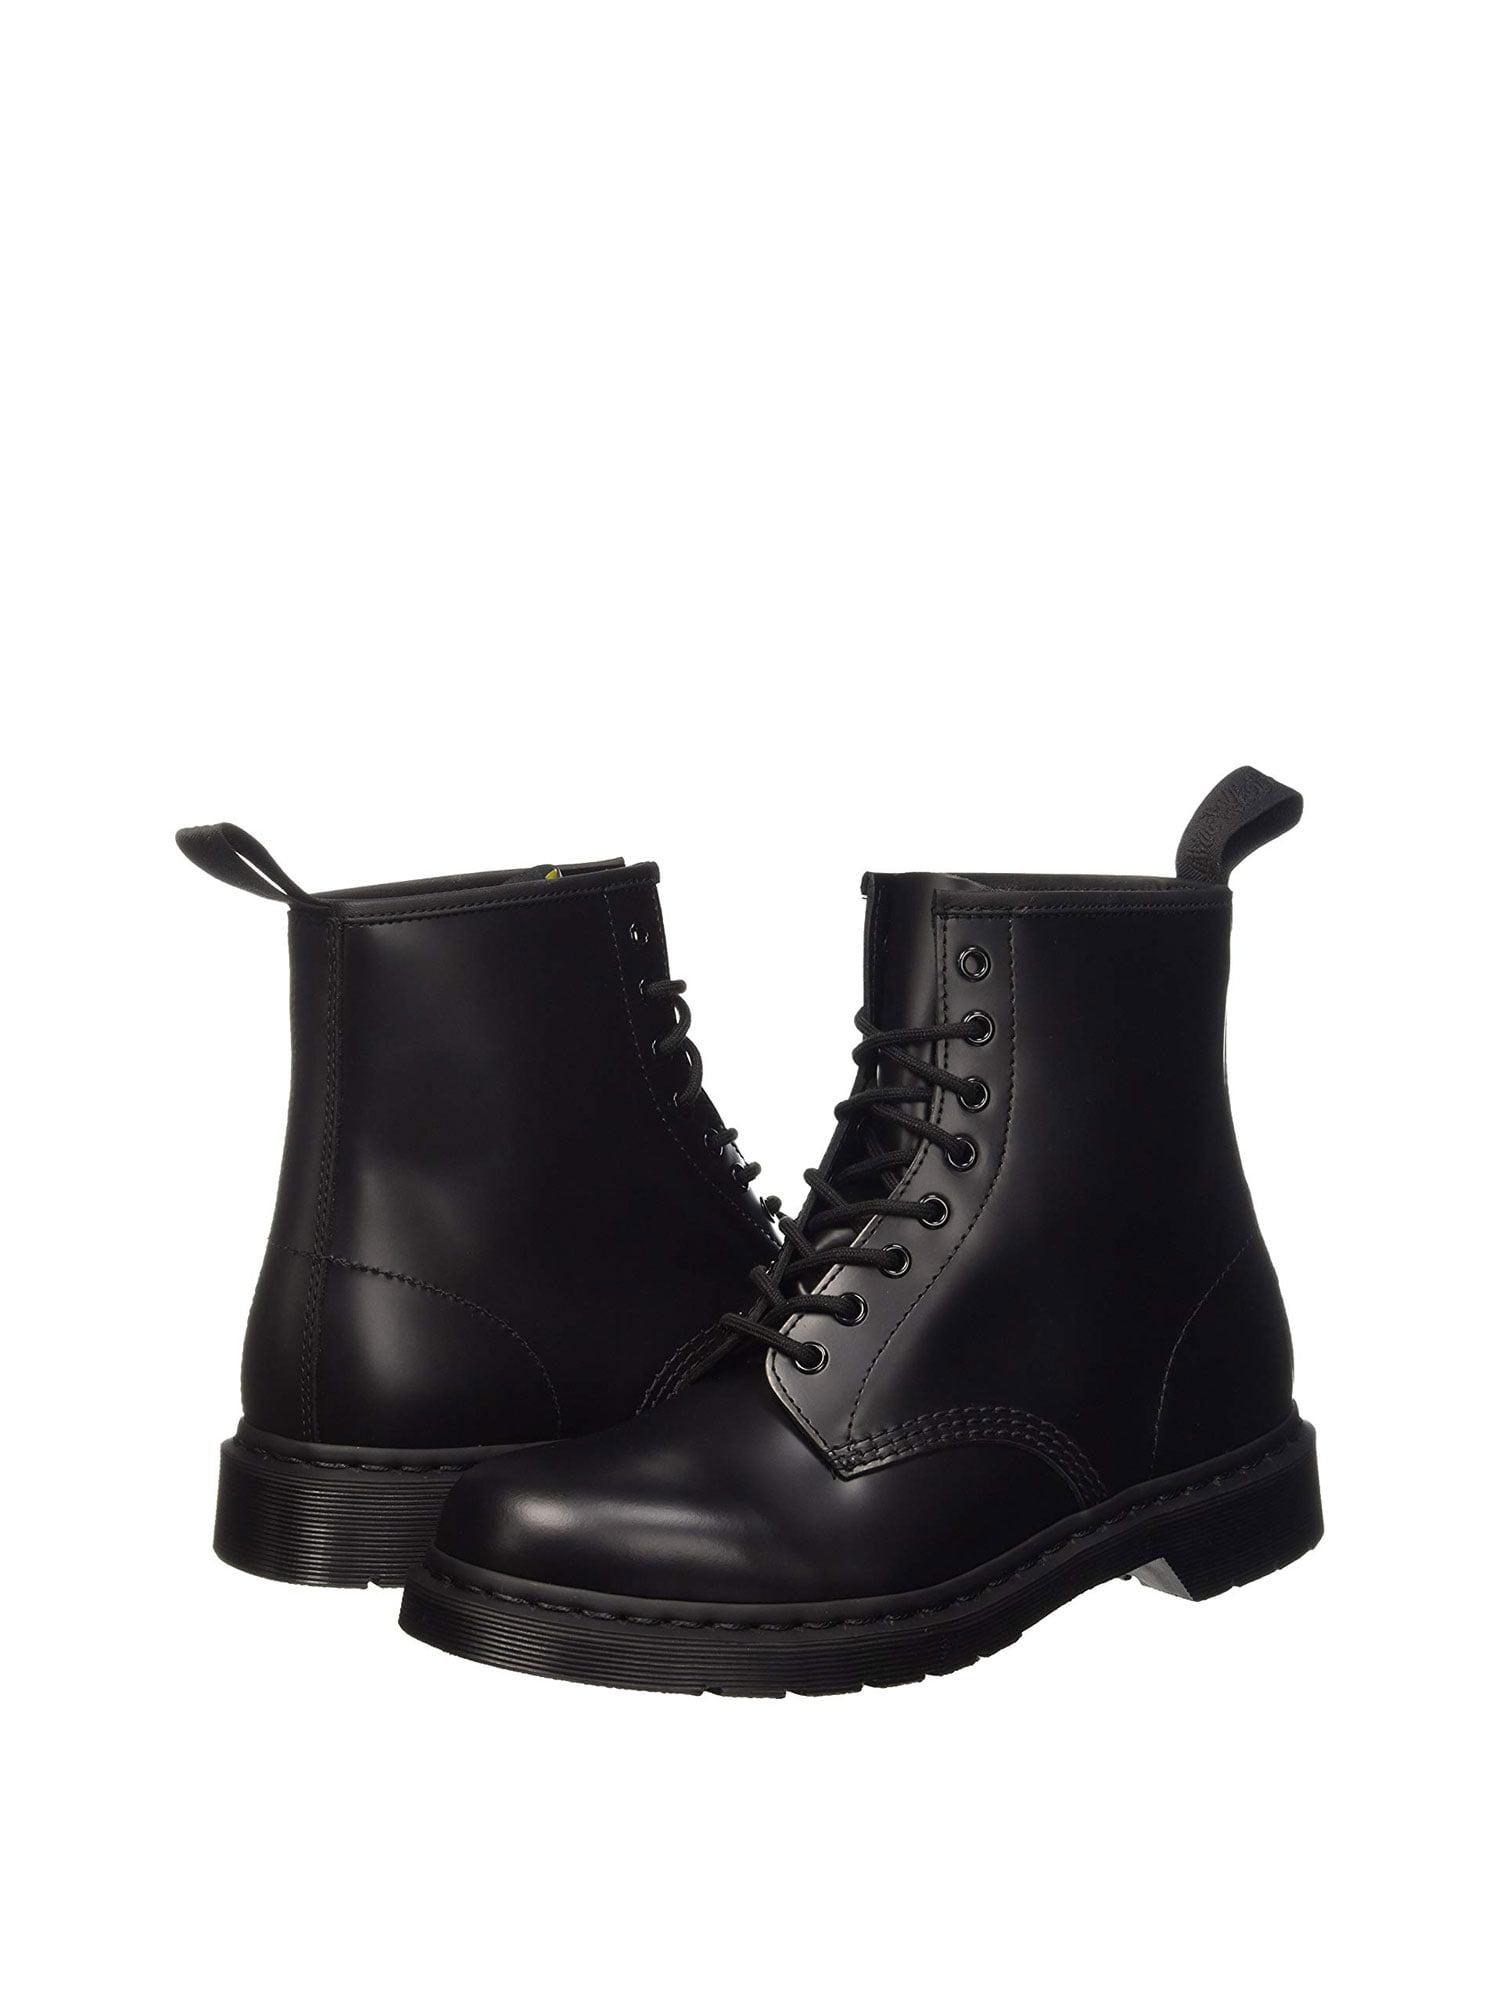 dr martens black 1460 8 eye boot boots